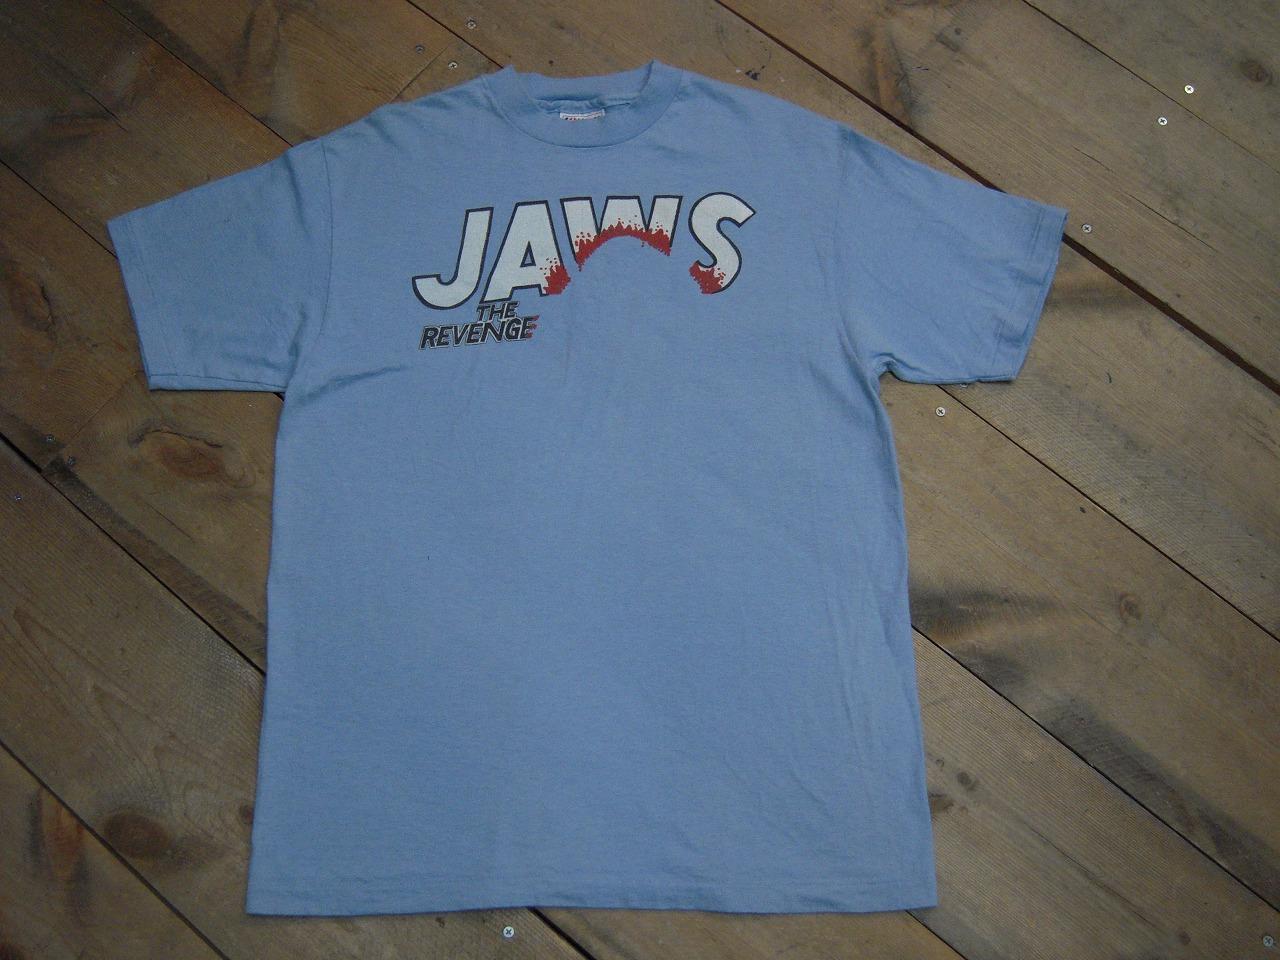 Jaws_d0121303_12336100.jpg